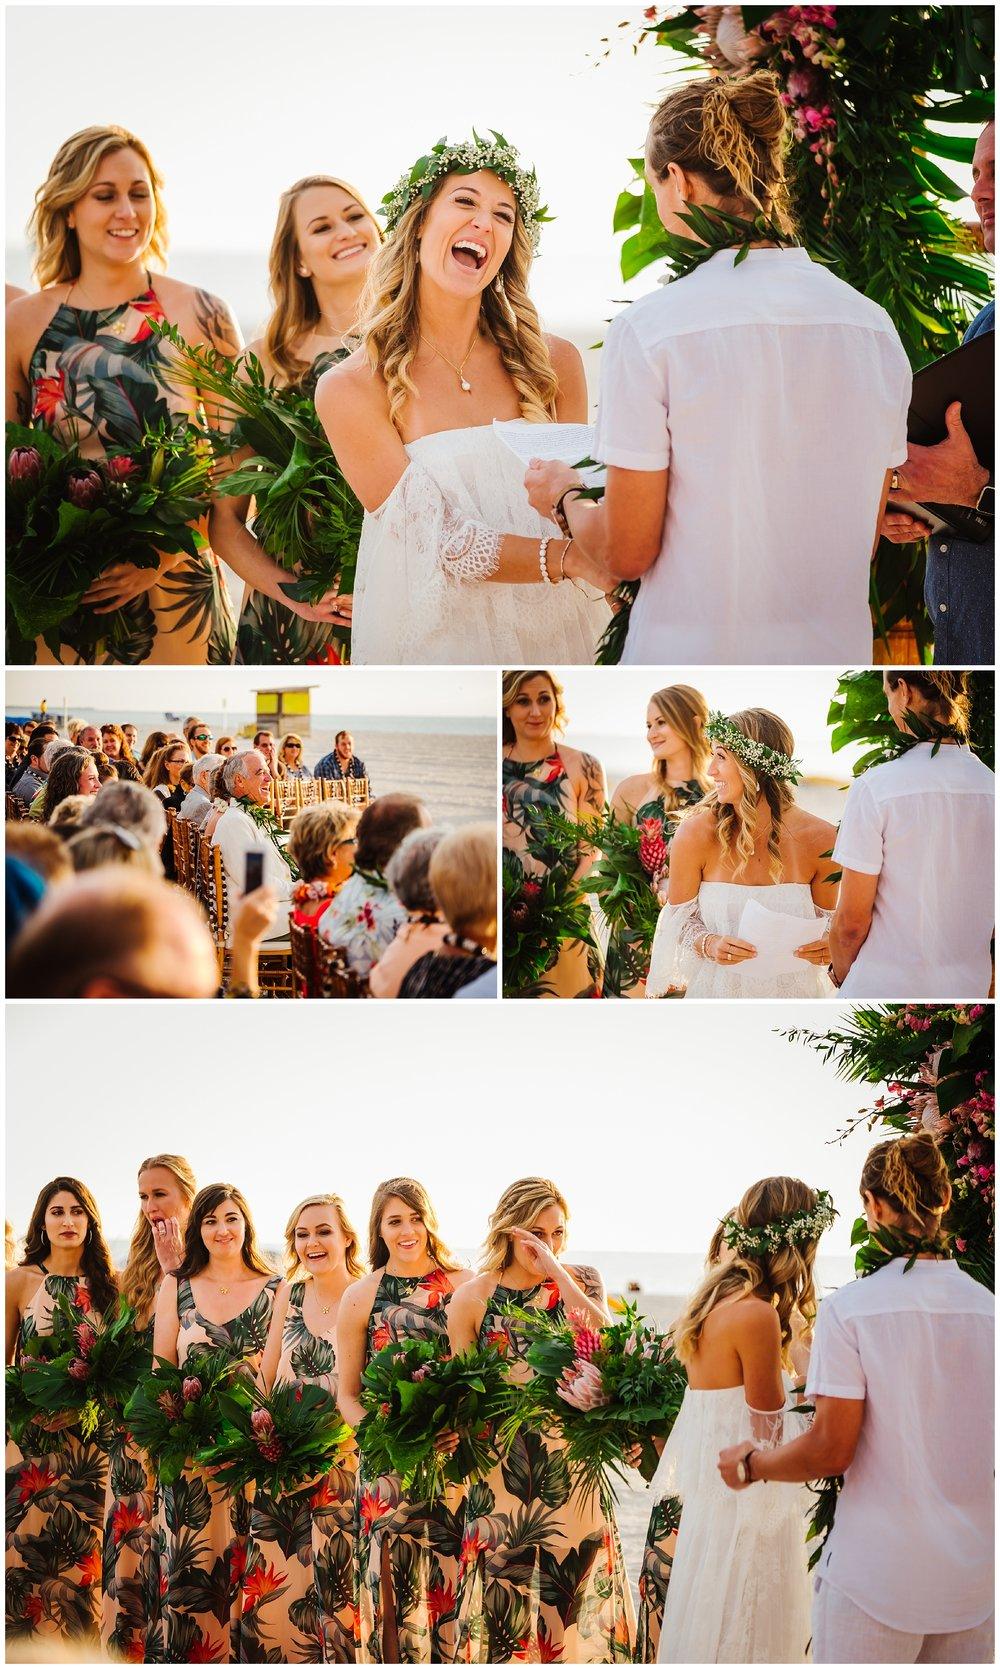 tampa-bay-wedding-photographer-barefoot-post-card-inn-tropical-hawaiin-lei-pink-pineapples-flower-crown_0173.jpg